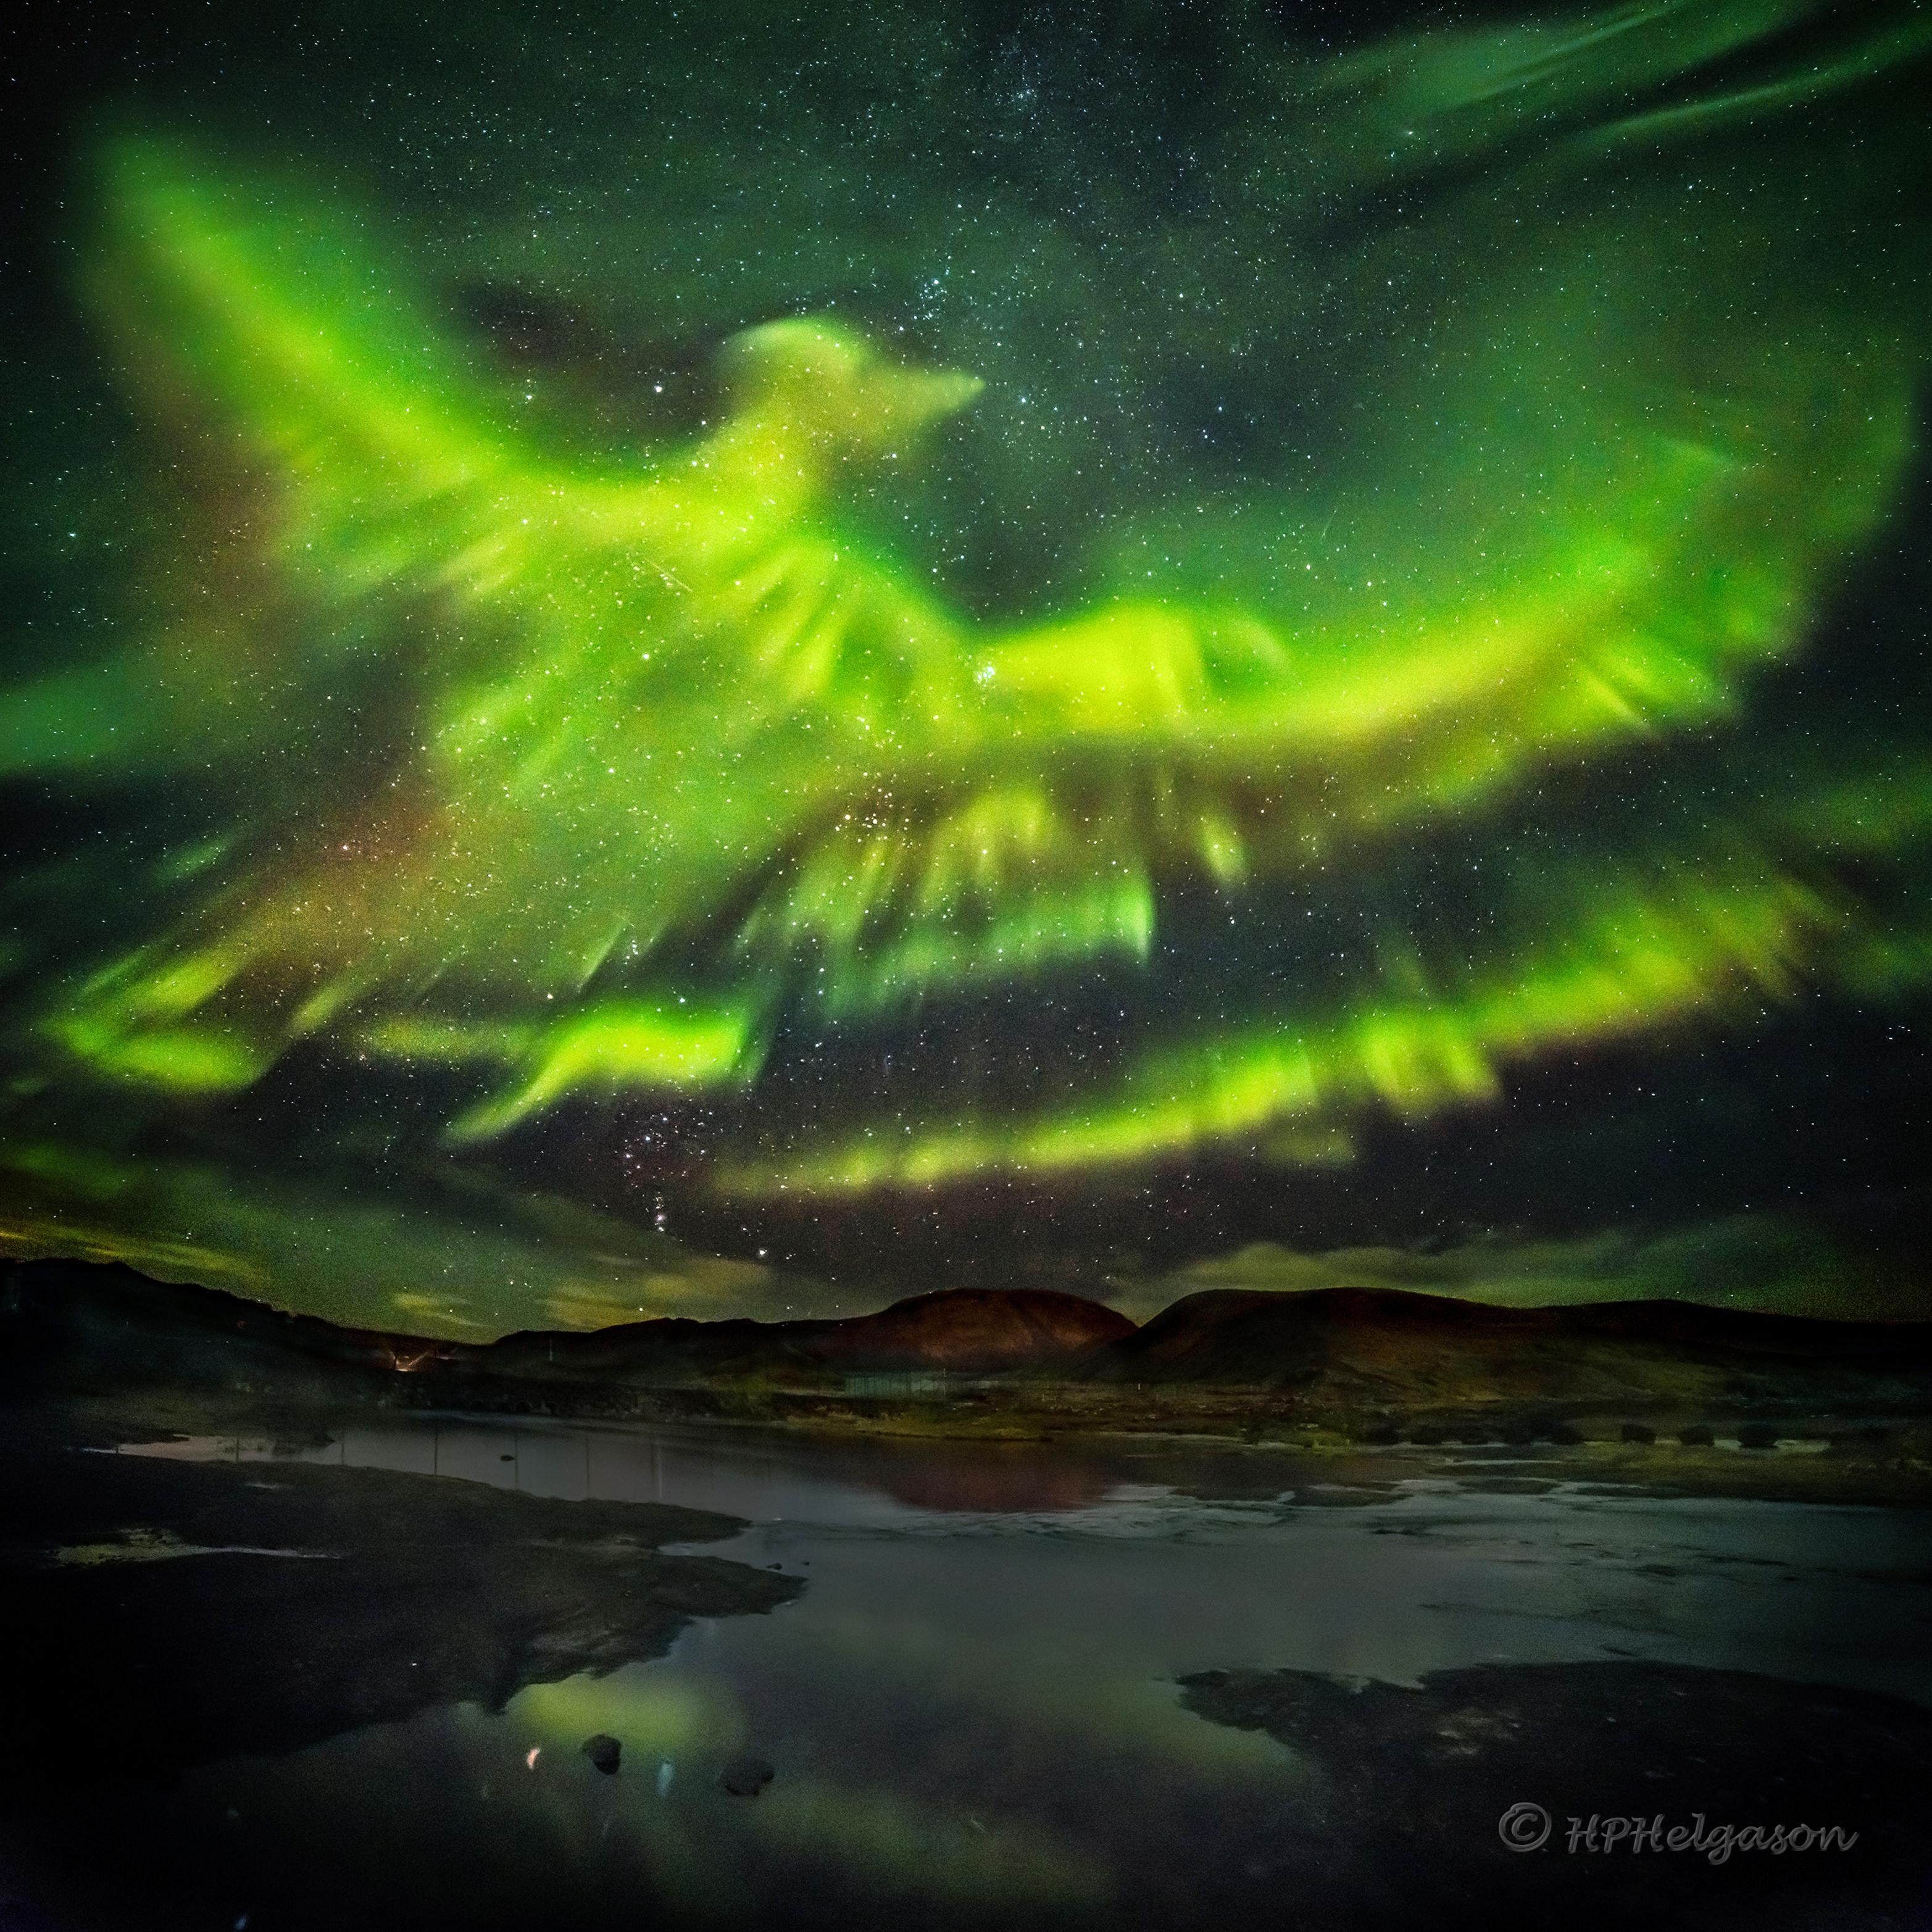 A Phoenix Aurora over Iceland Image Credit & Copyright: Hallgrimur P. Helgason